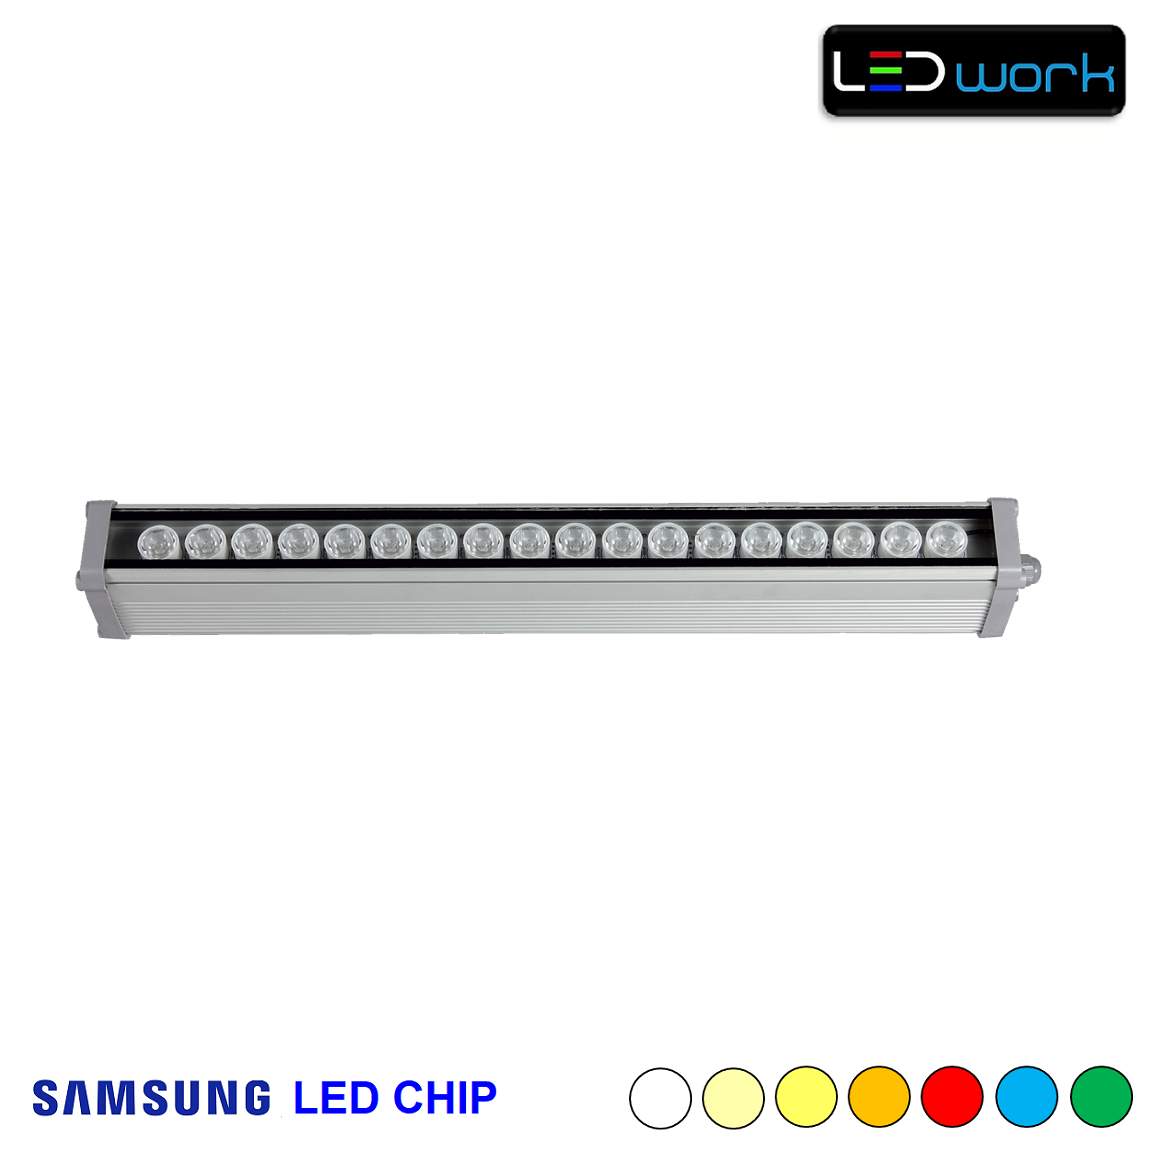 50 cm 18 Watt SAMSUNG LED Chip Sıva Üstü Wallwasher